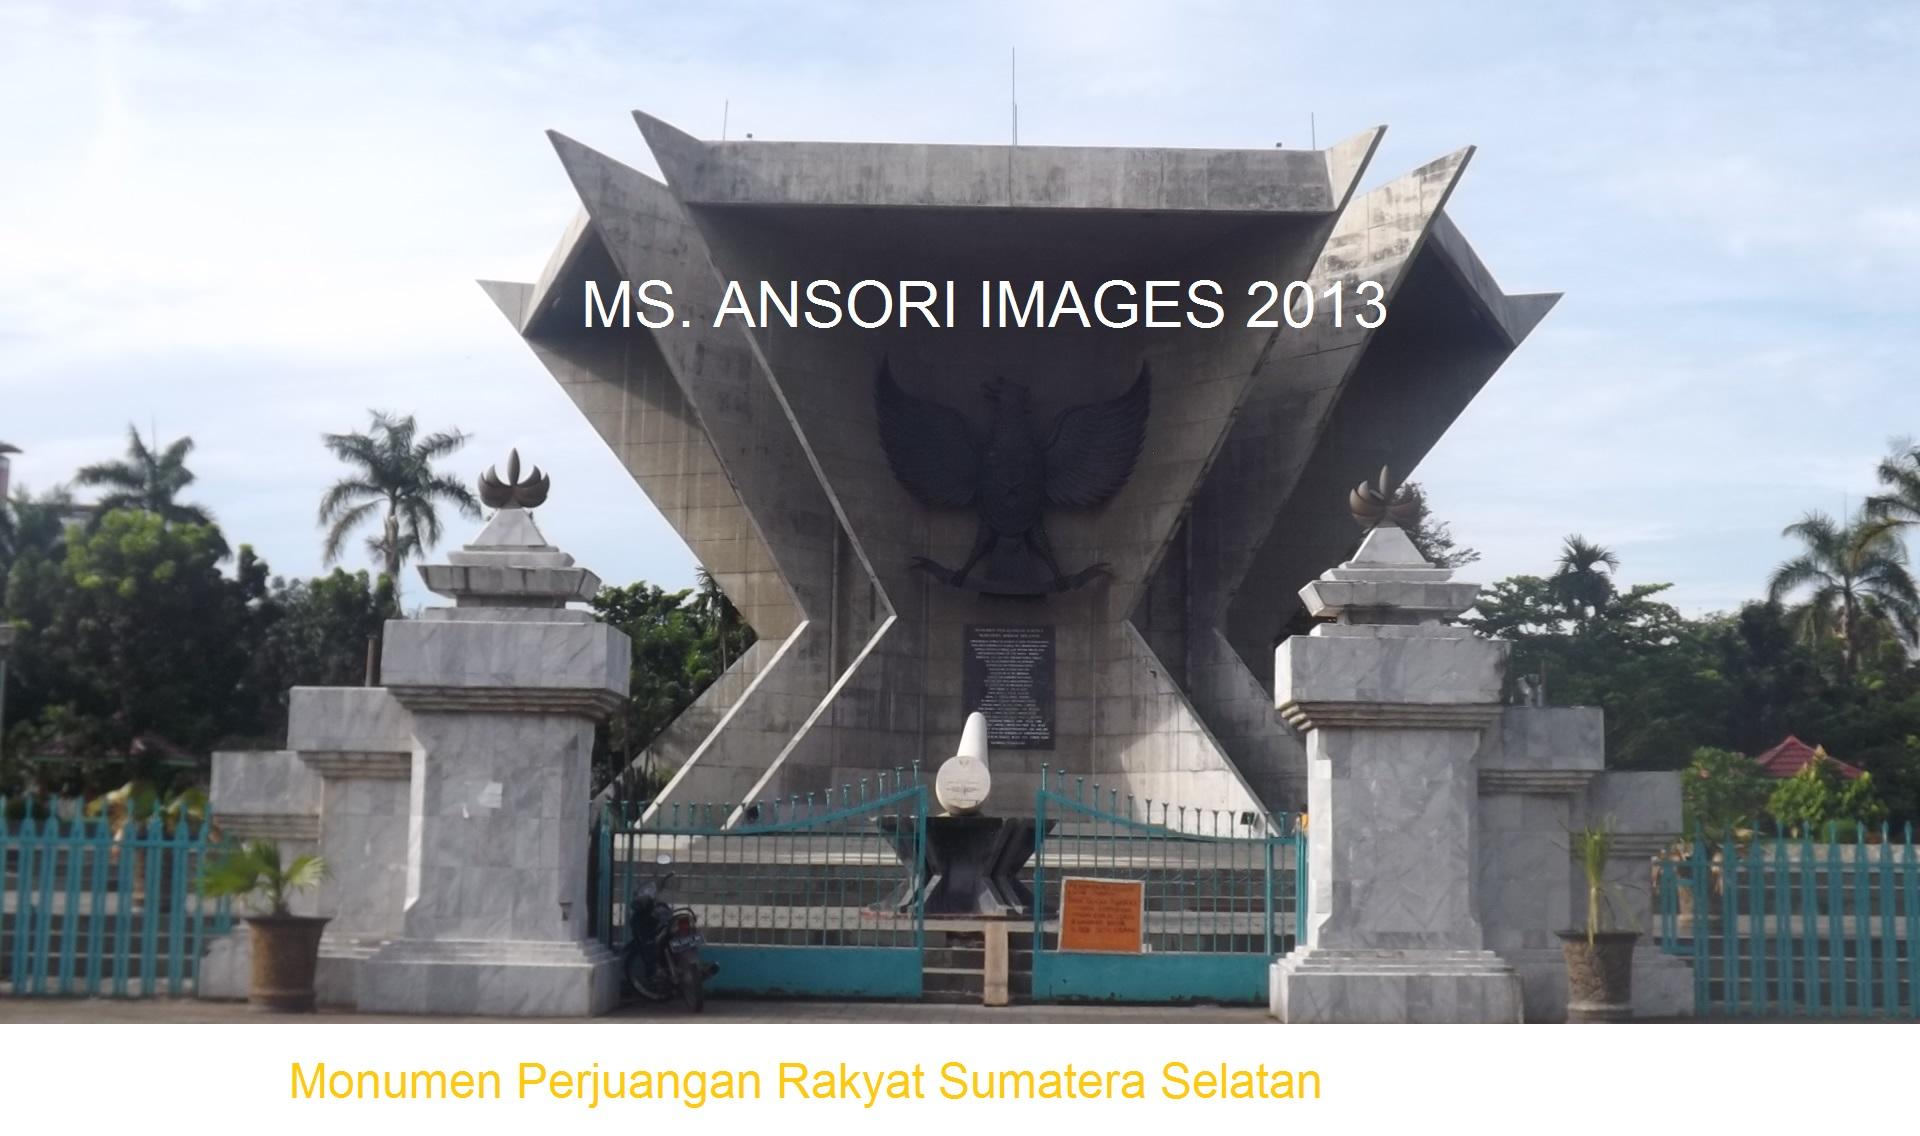 Masjid Agung Palembang Nyaman Corat Coret Kehidupan Nah Setelah Melihat